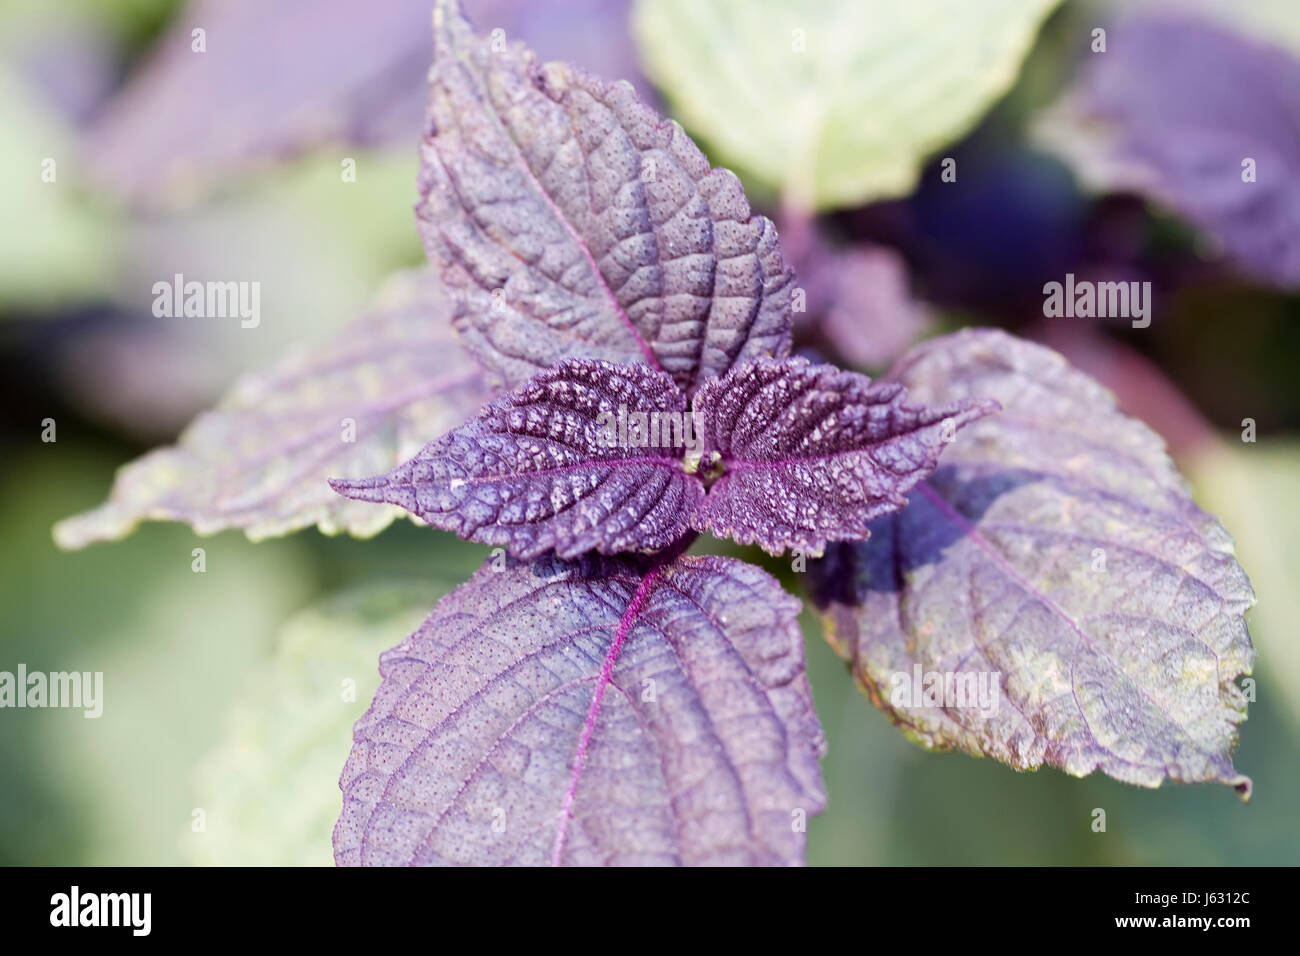 leaves homeopathy herb medicinal plant herbs macro close-up macro admission Stock Photo